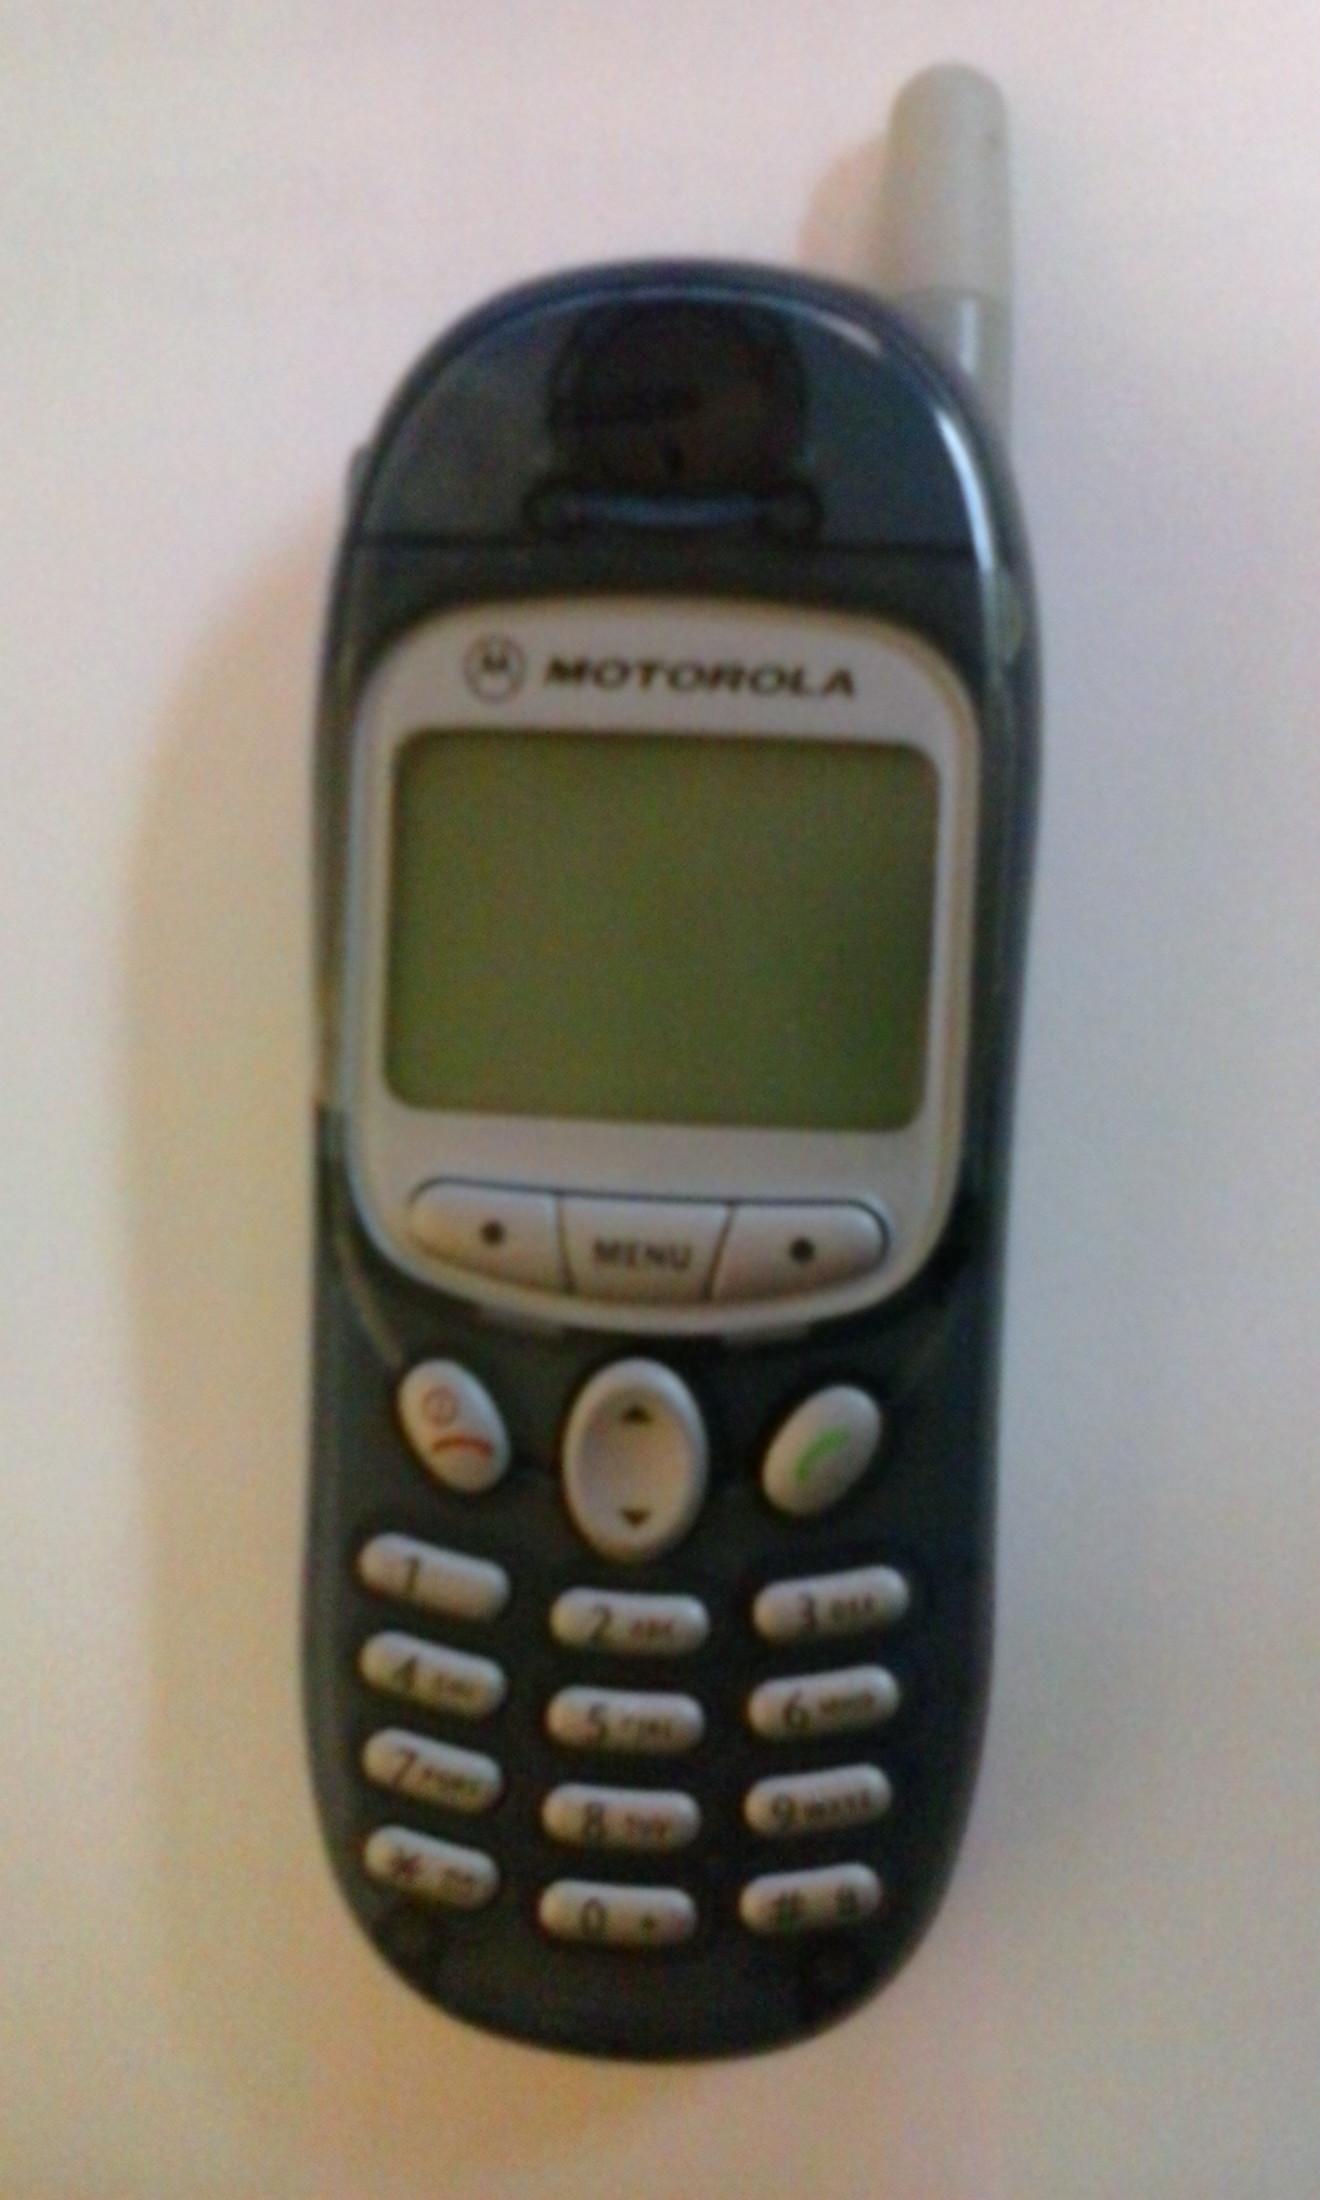 Motorola T190 - Cellphone